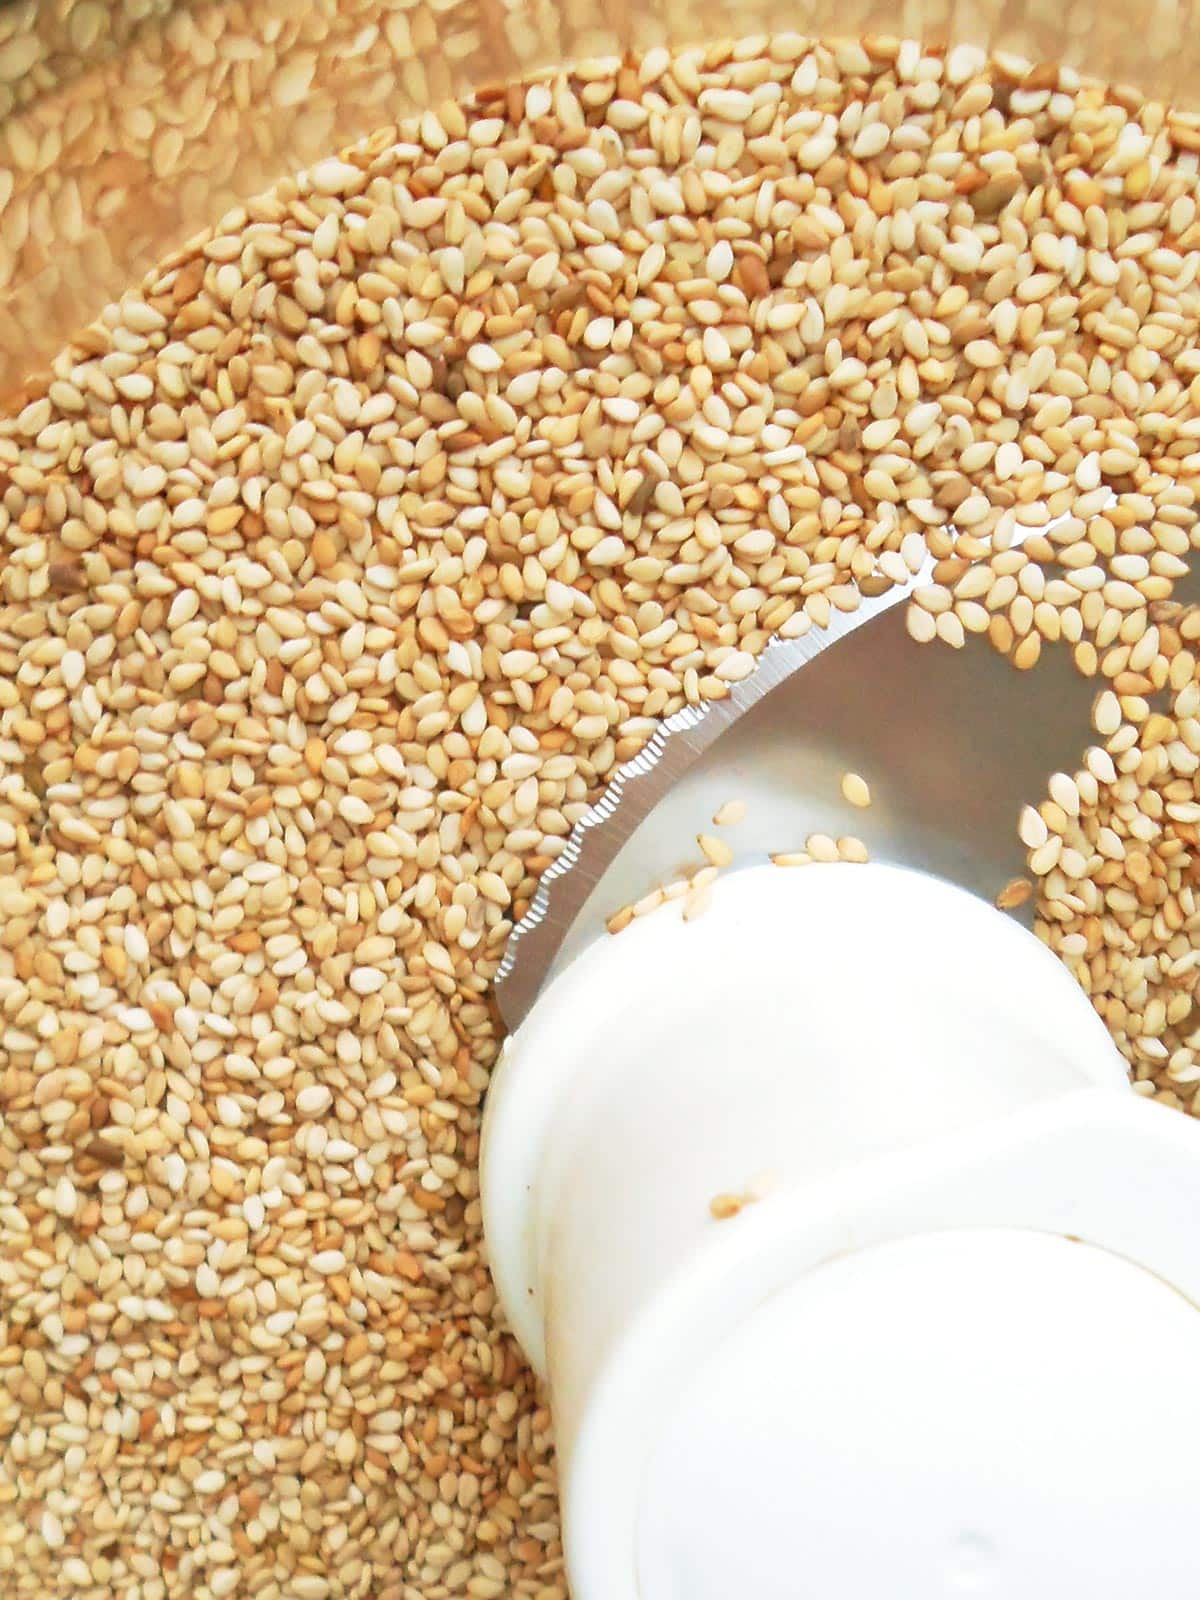 Sesame seeds in food processor